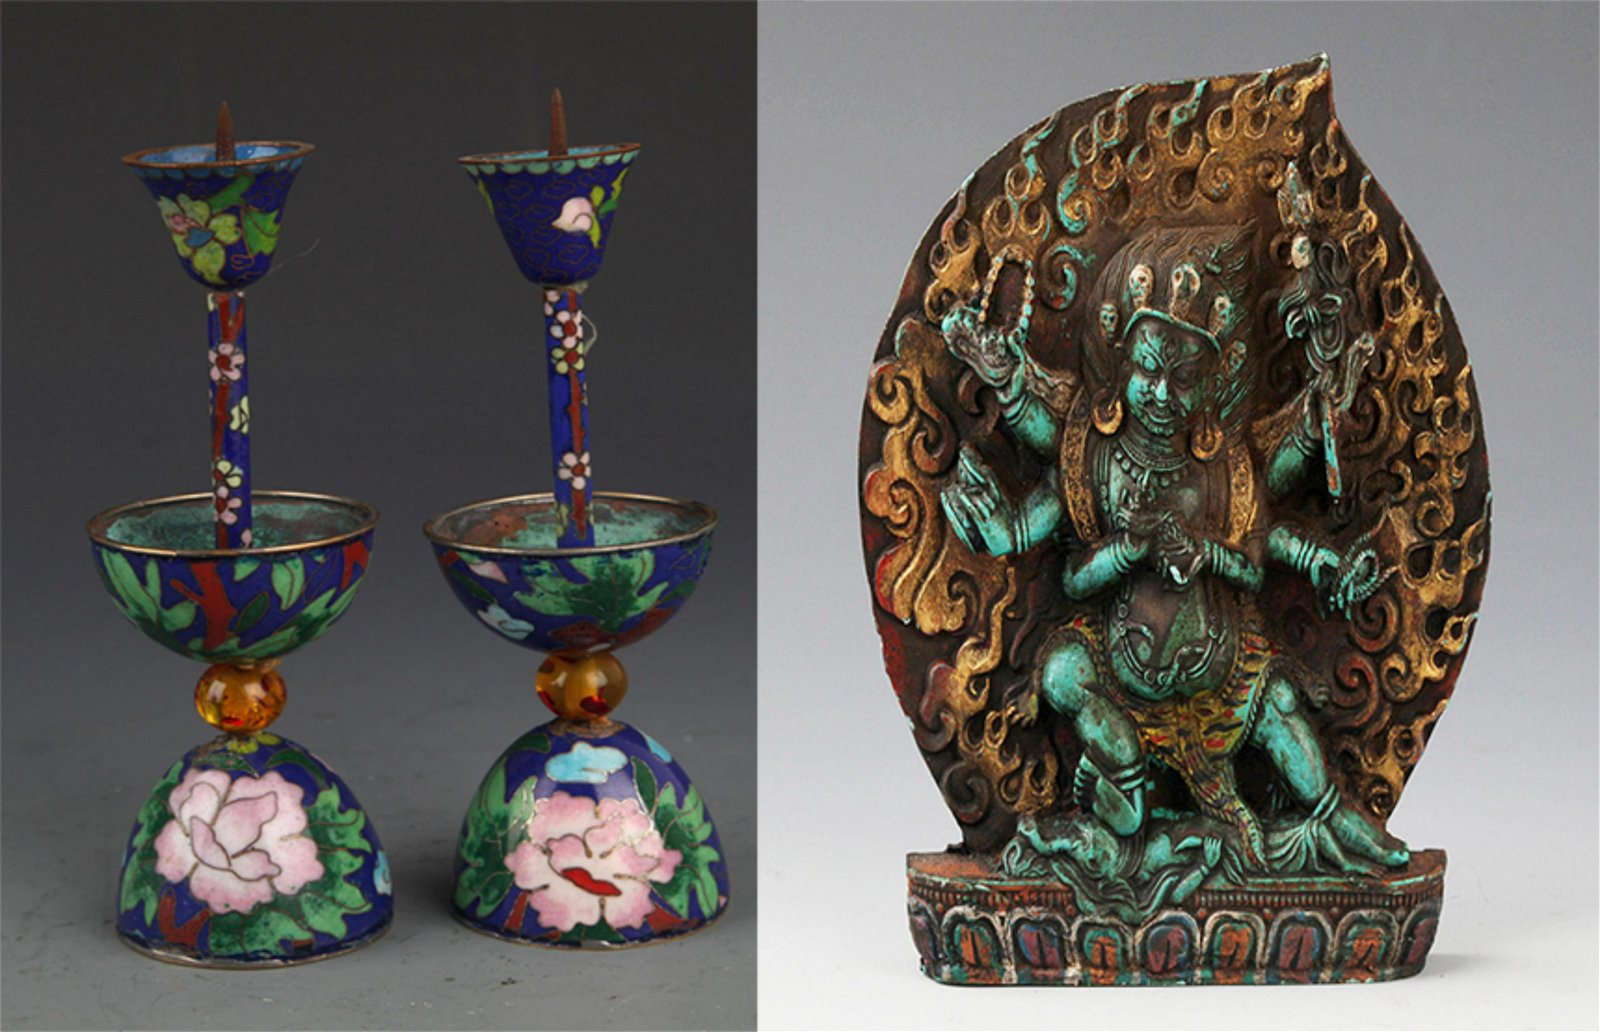 CLOISONNE CANDLE HOLDER AND TIBETAN BUDDHA